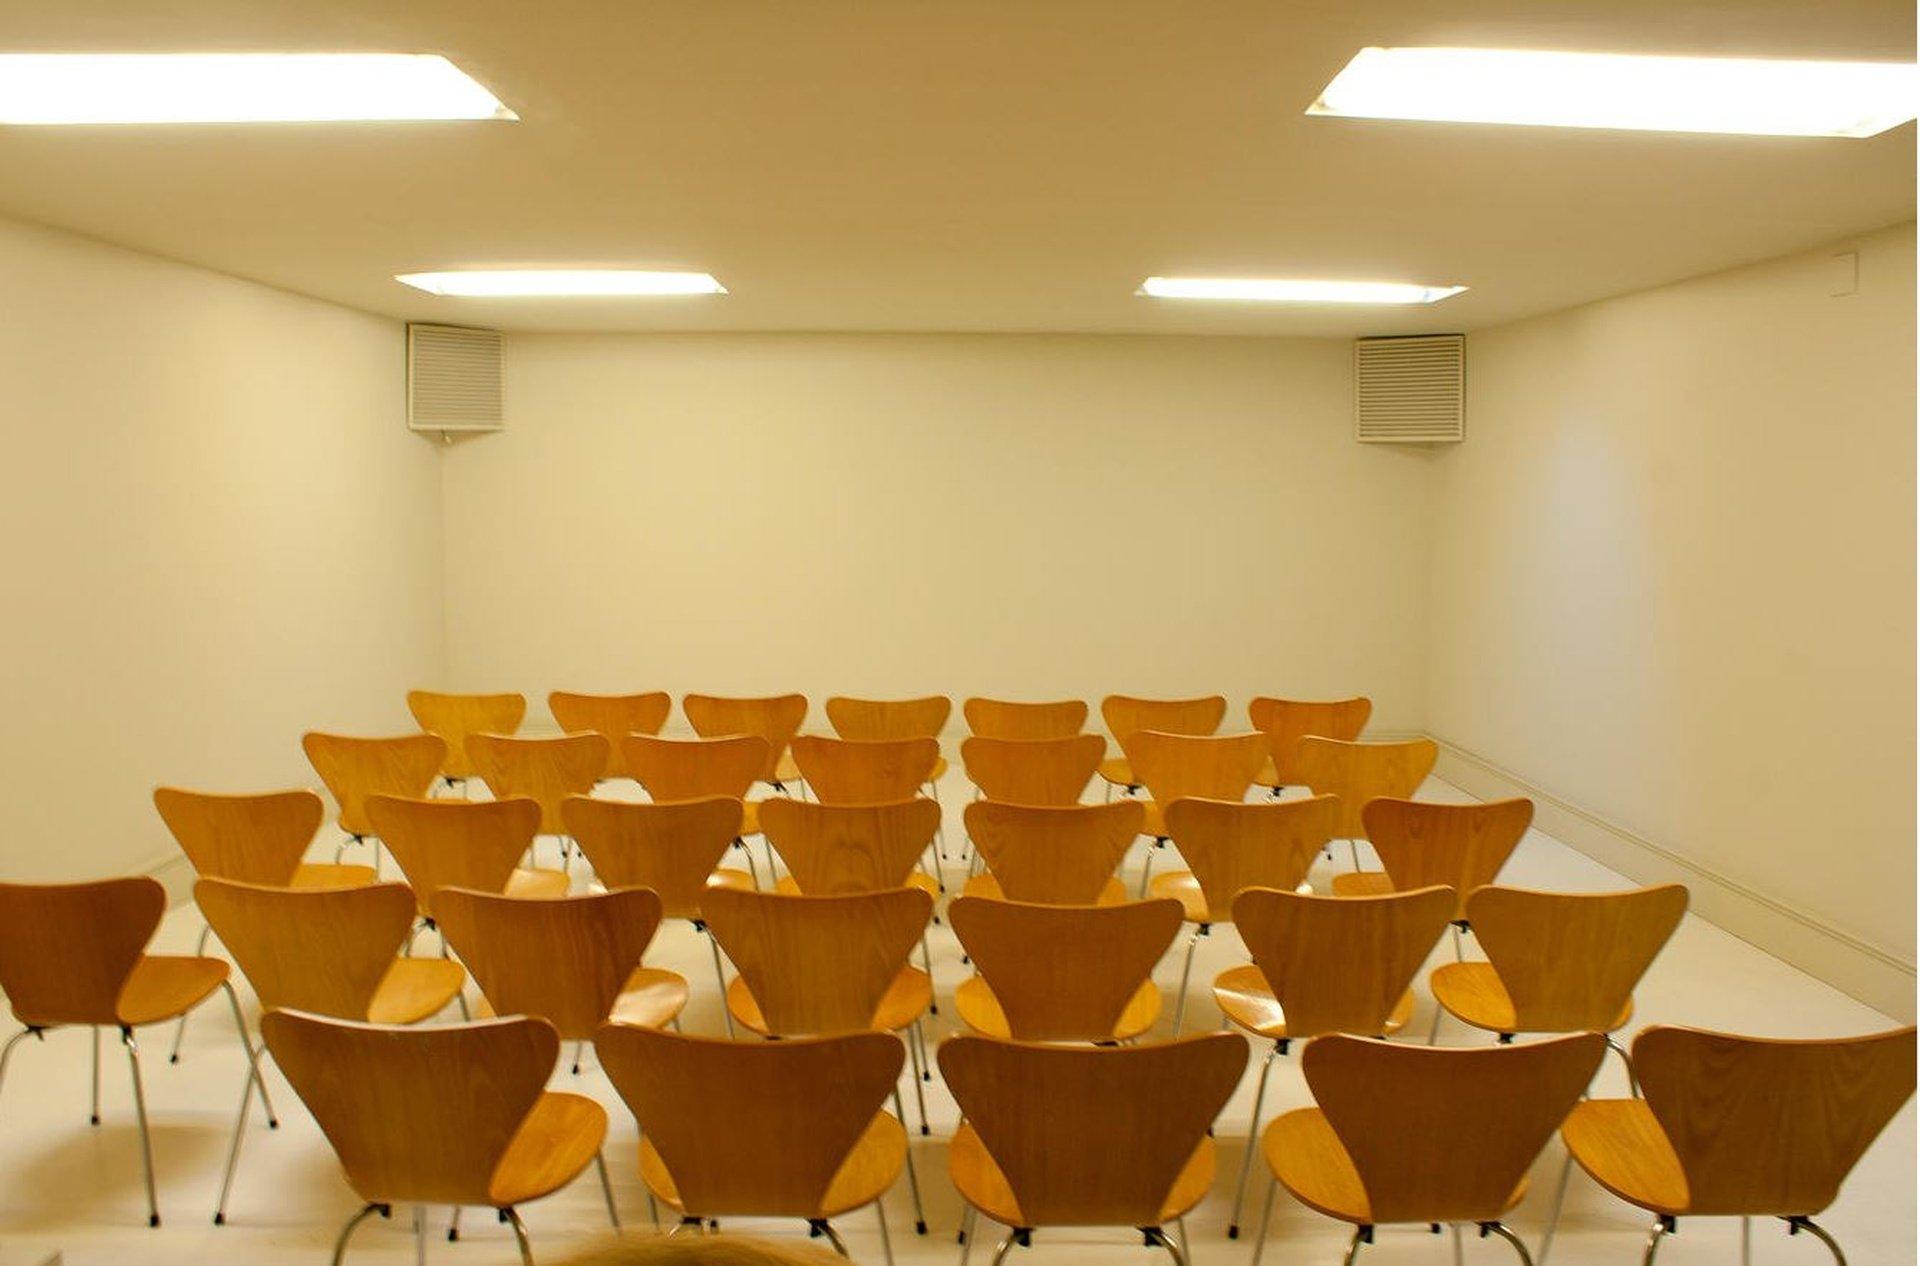 Barcelona training rooms Galerie Espai D - Basement image 0